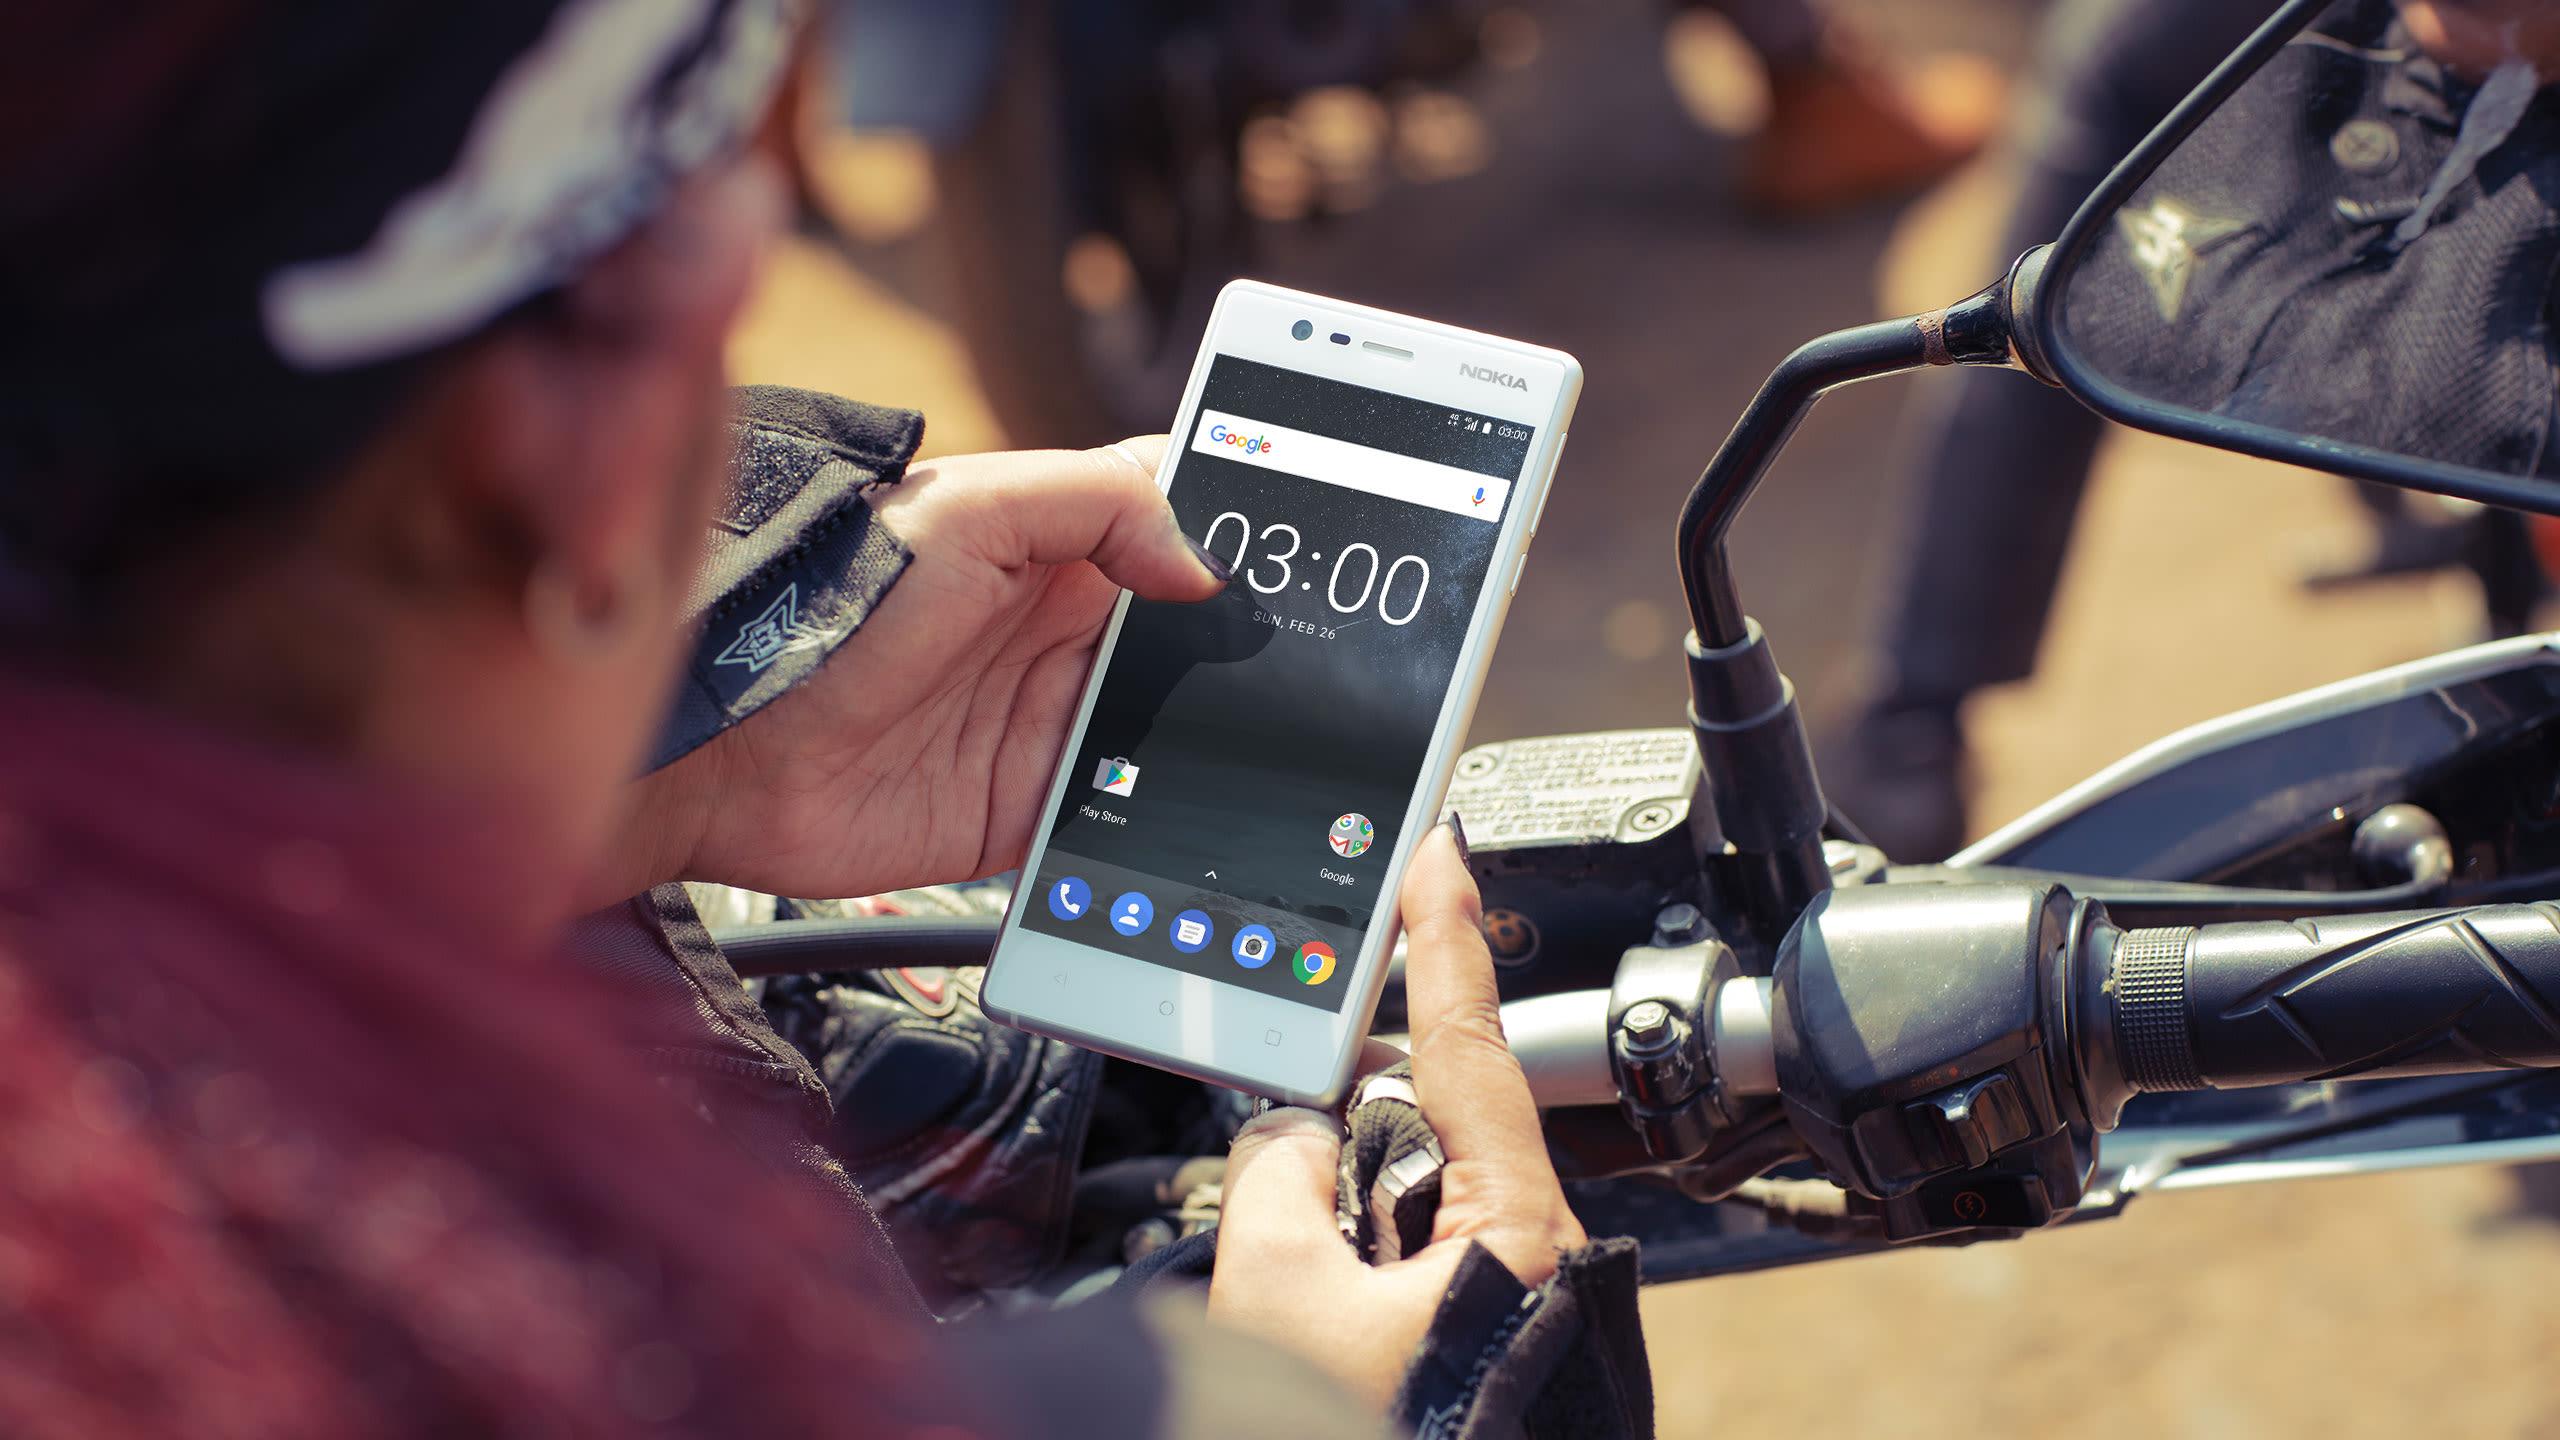 Nokia-3-Bright-Display.jpg